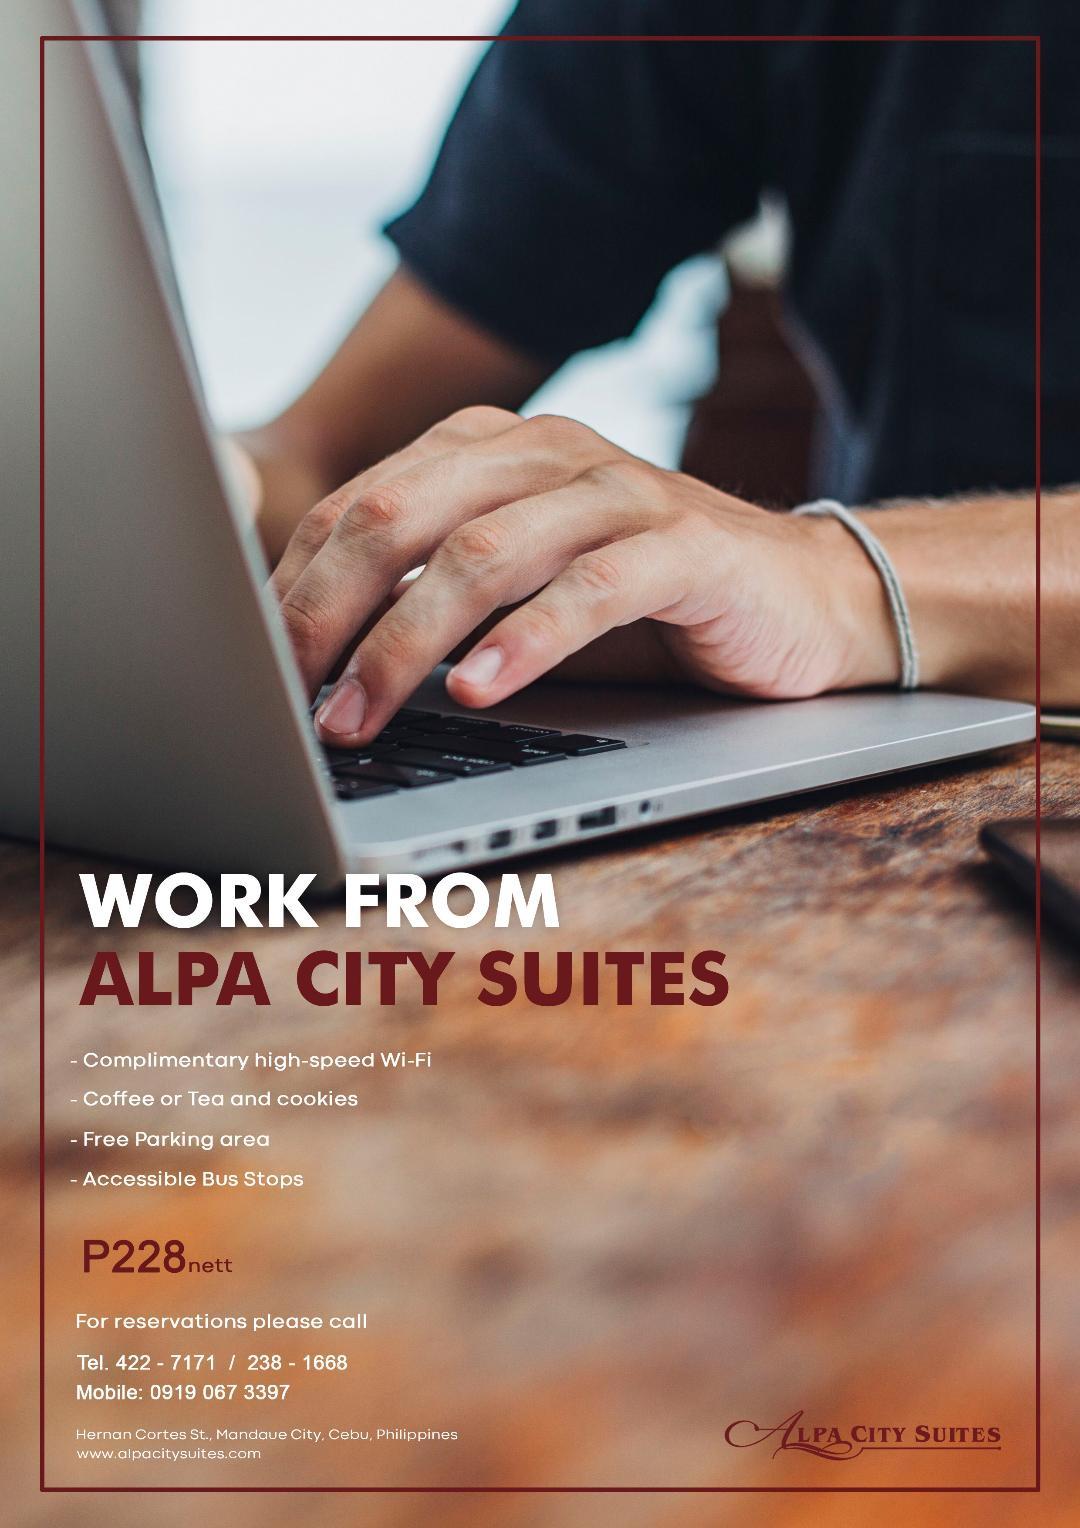 D:\2020 DESKTOP FILES\RMA NEWS\ARTICLES\ARTICLE 619 - ALPA CITY SUITES WORK FROM HOTEL\6.jpg